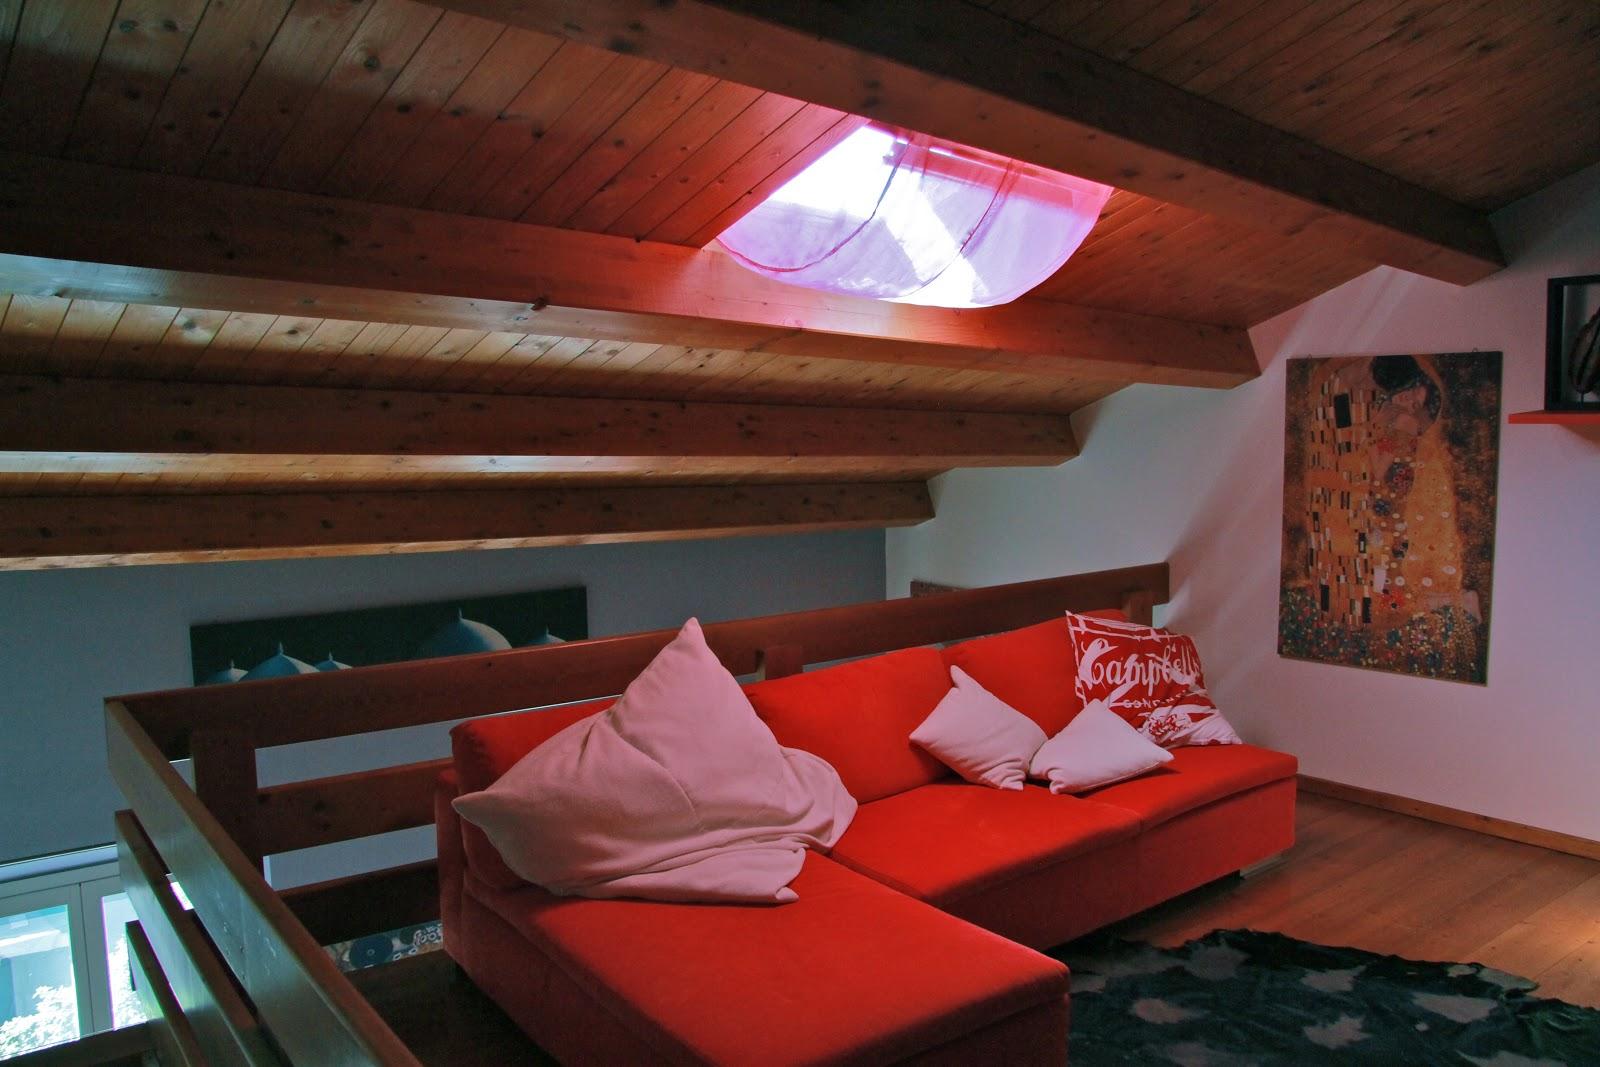 Seaseight design blog focus on la tenda per lucernari for Tende oscuranti per velux non originali